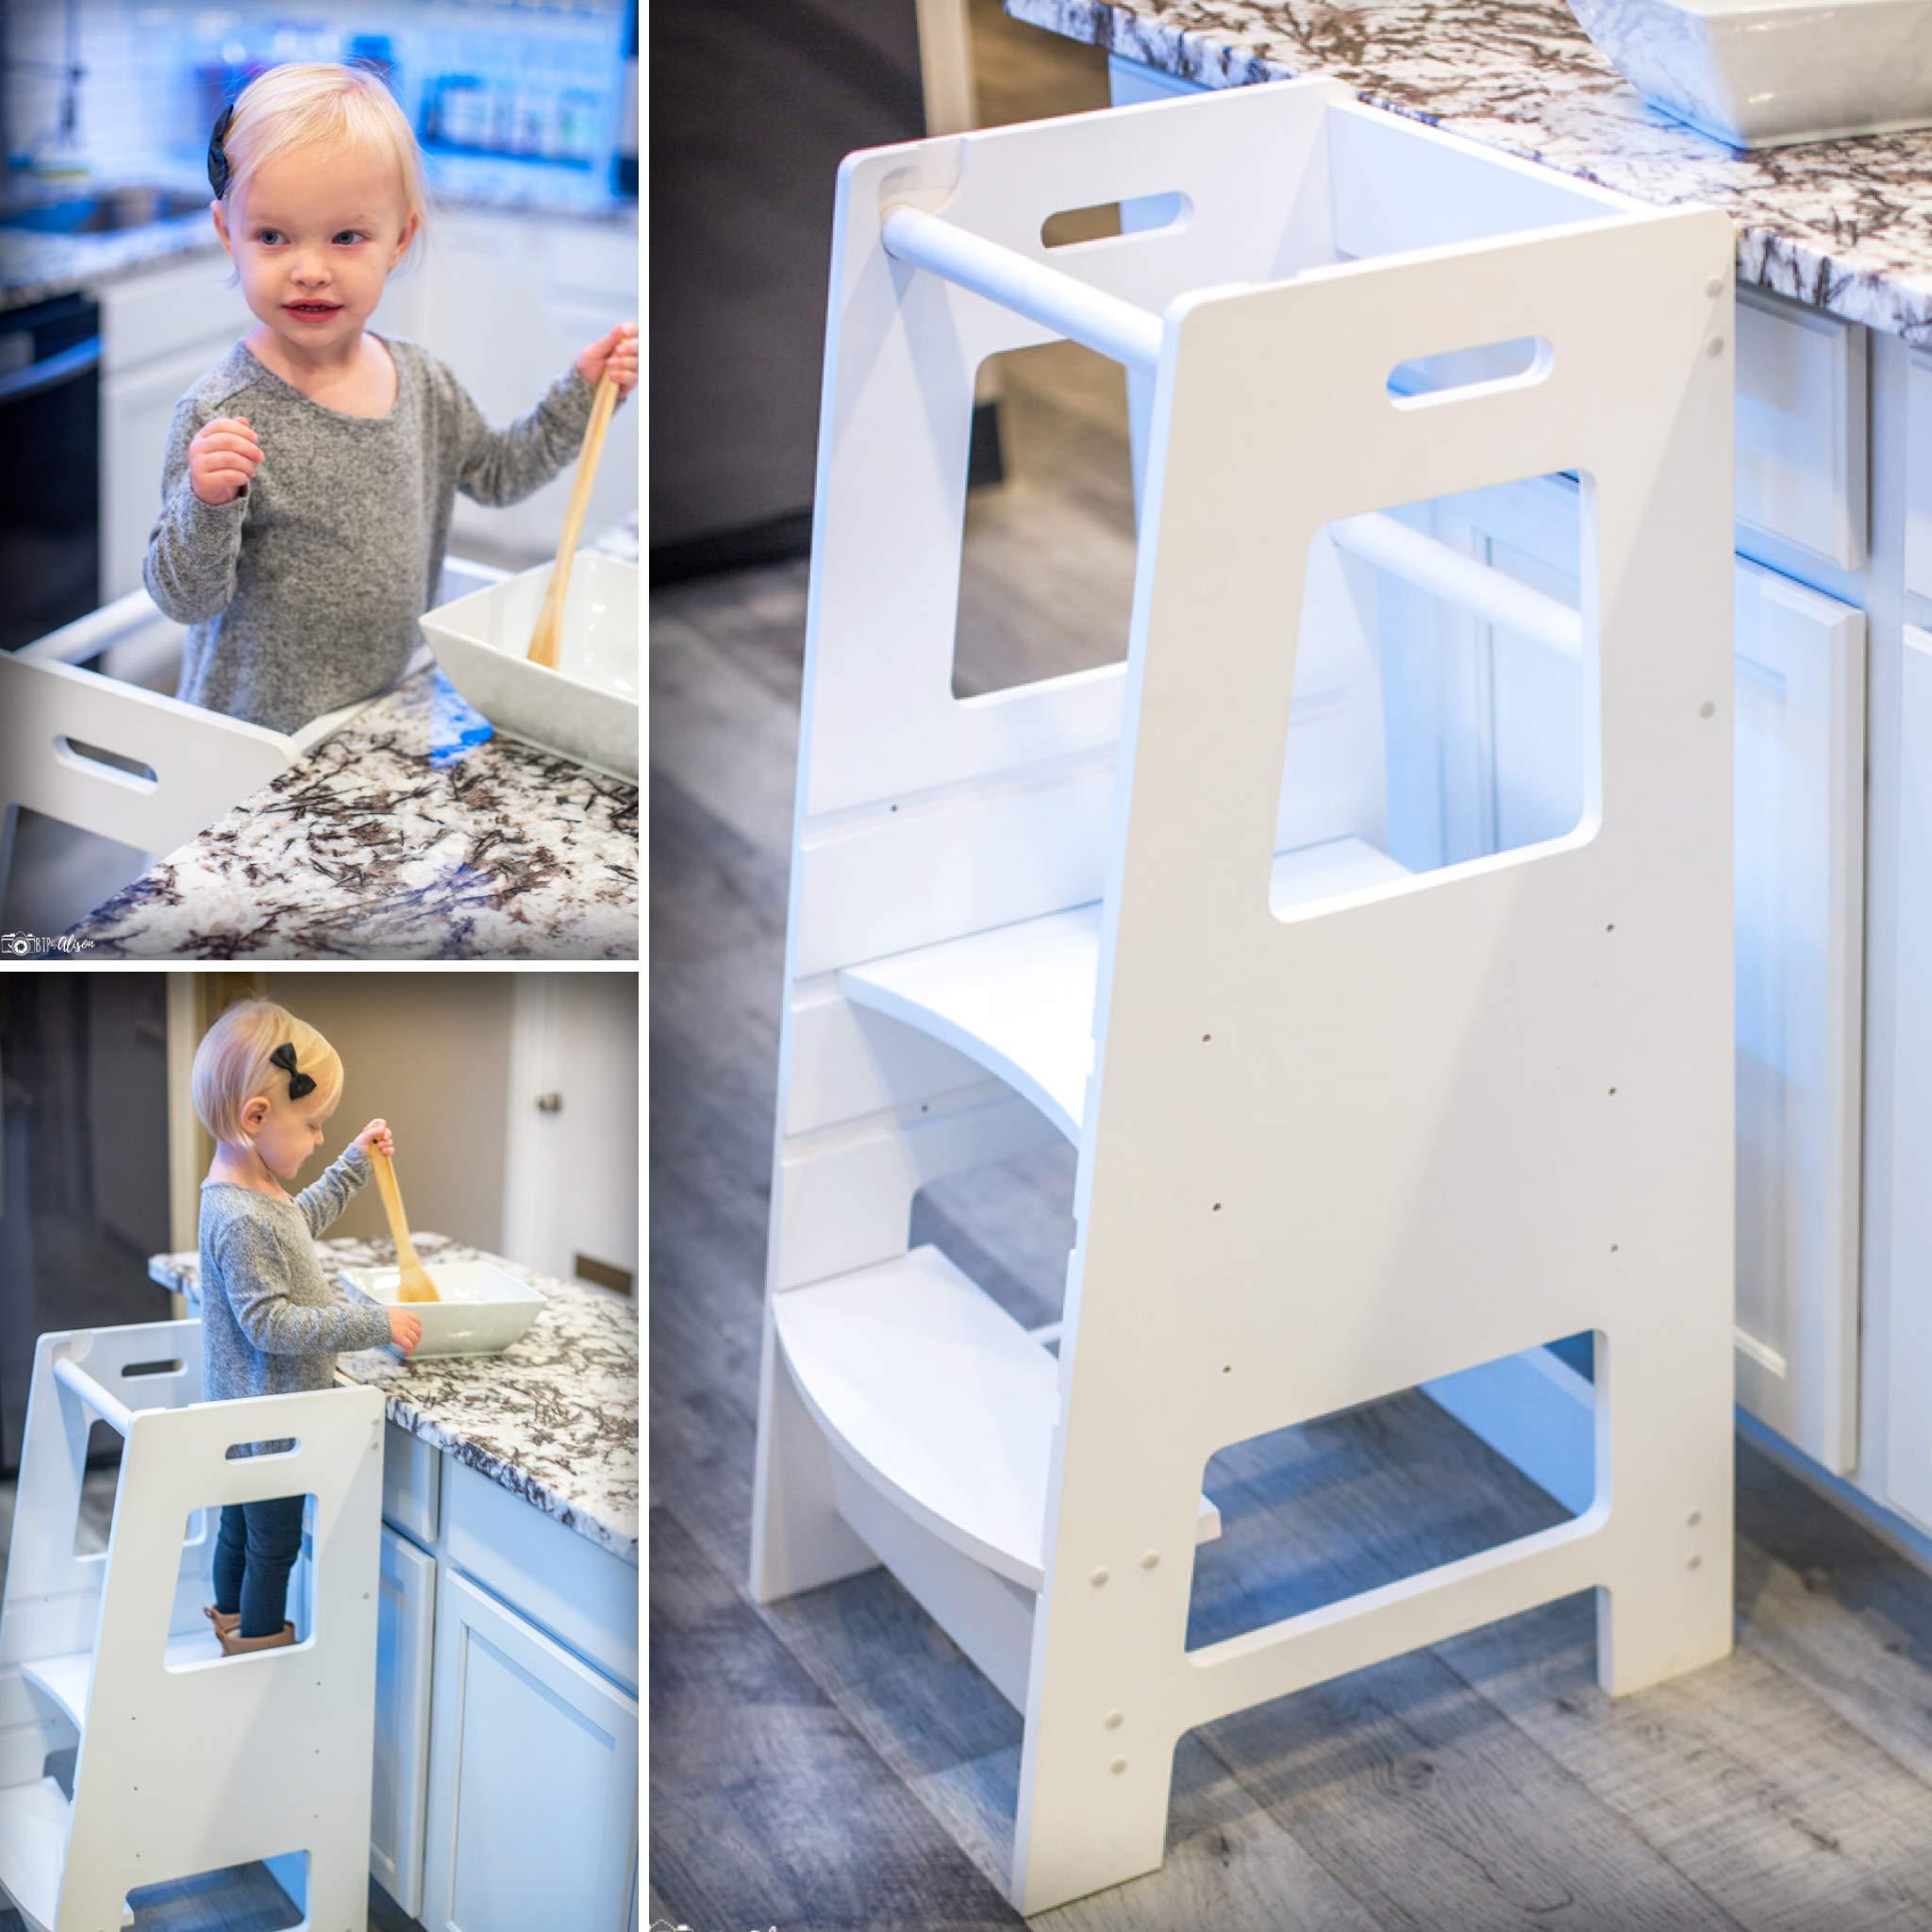 KidzWerks Child Standing Tower - White Child Kitchen Step Stool with Adjustable Standing Platform - Wooden Montessori Standing Tower - Kid's Step Stool